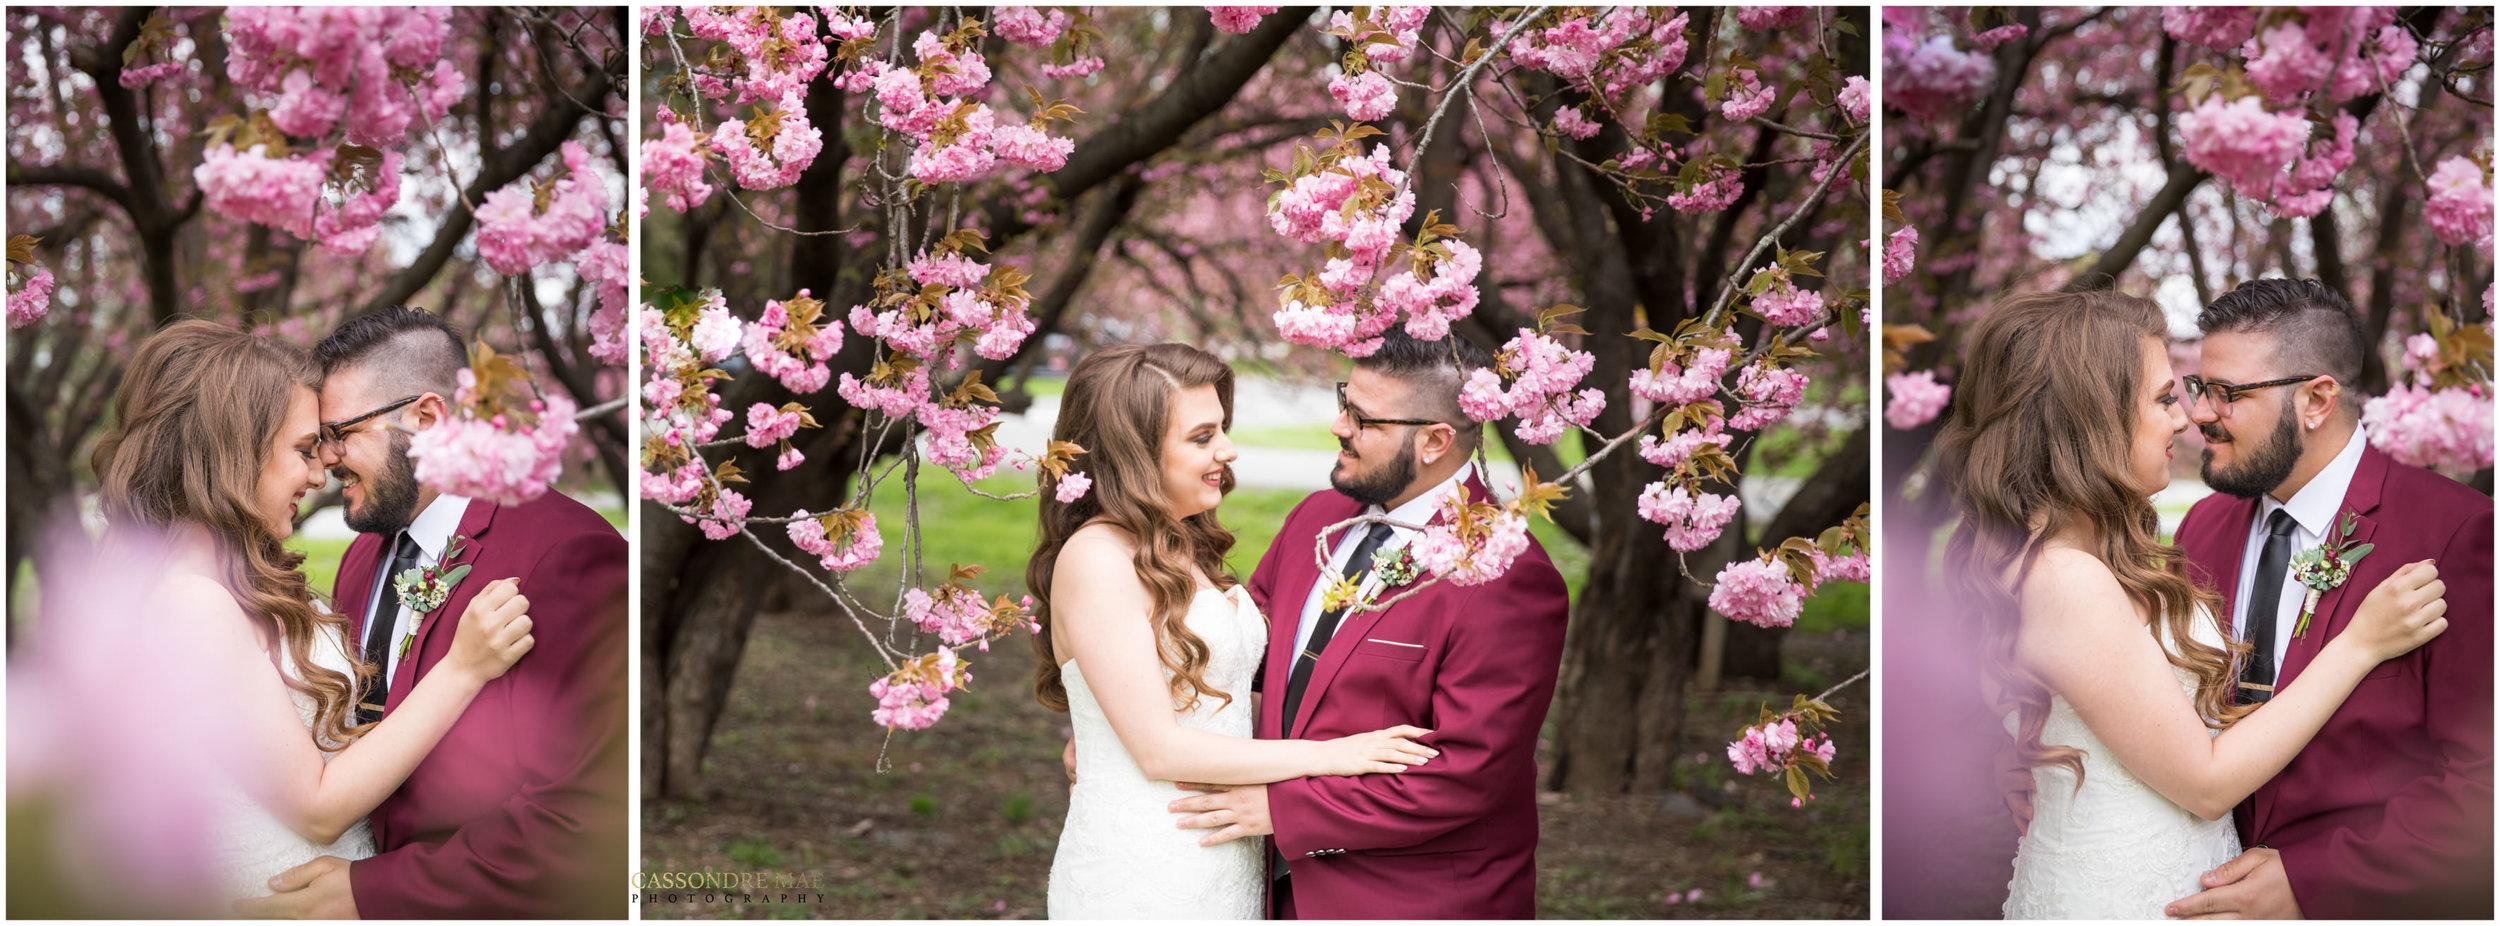 Cassondre Mae Photography Cove Castle Weddings 1.jpg